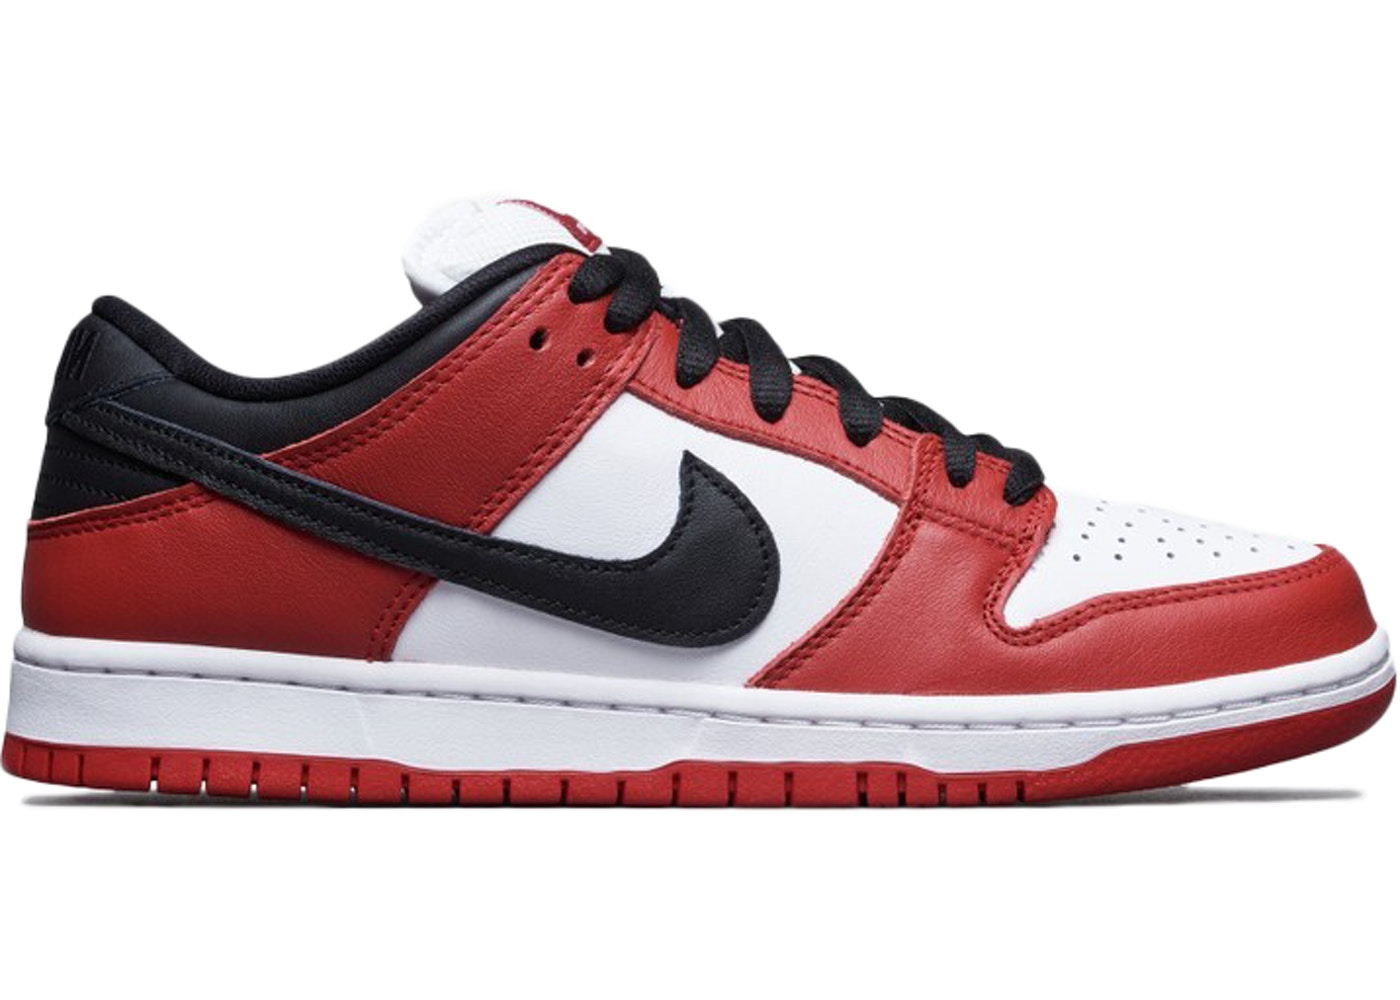 Adaptabilidad Decir la verdad embargo  Nike SB Dunk Low J-Pack Chicago - BQ6817-600